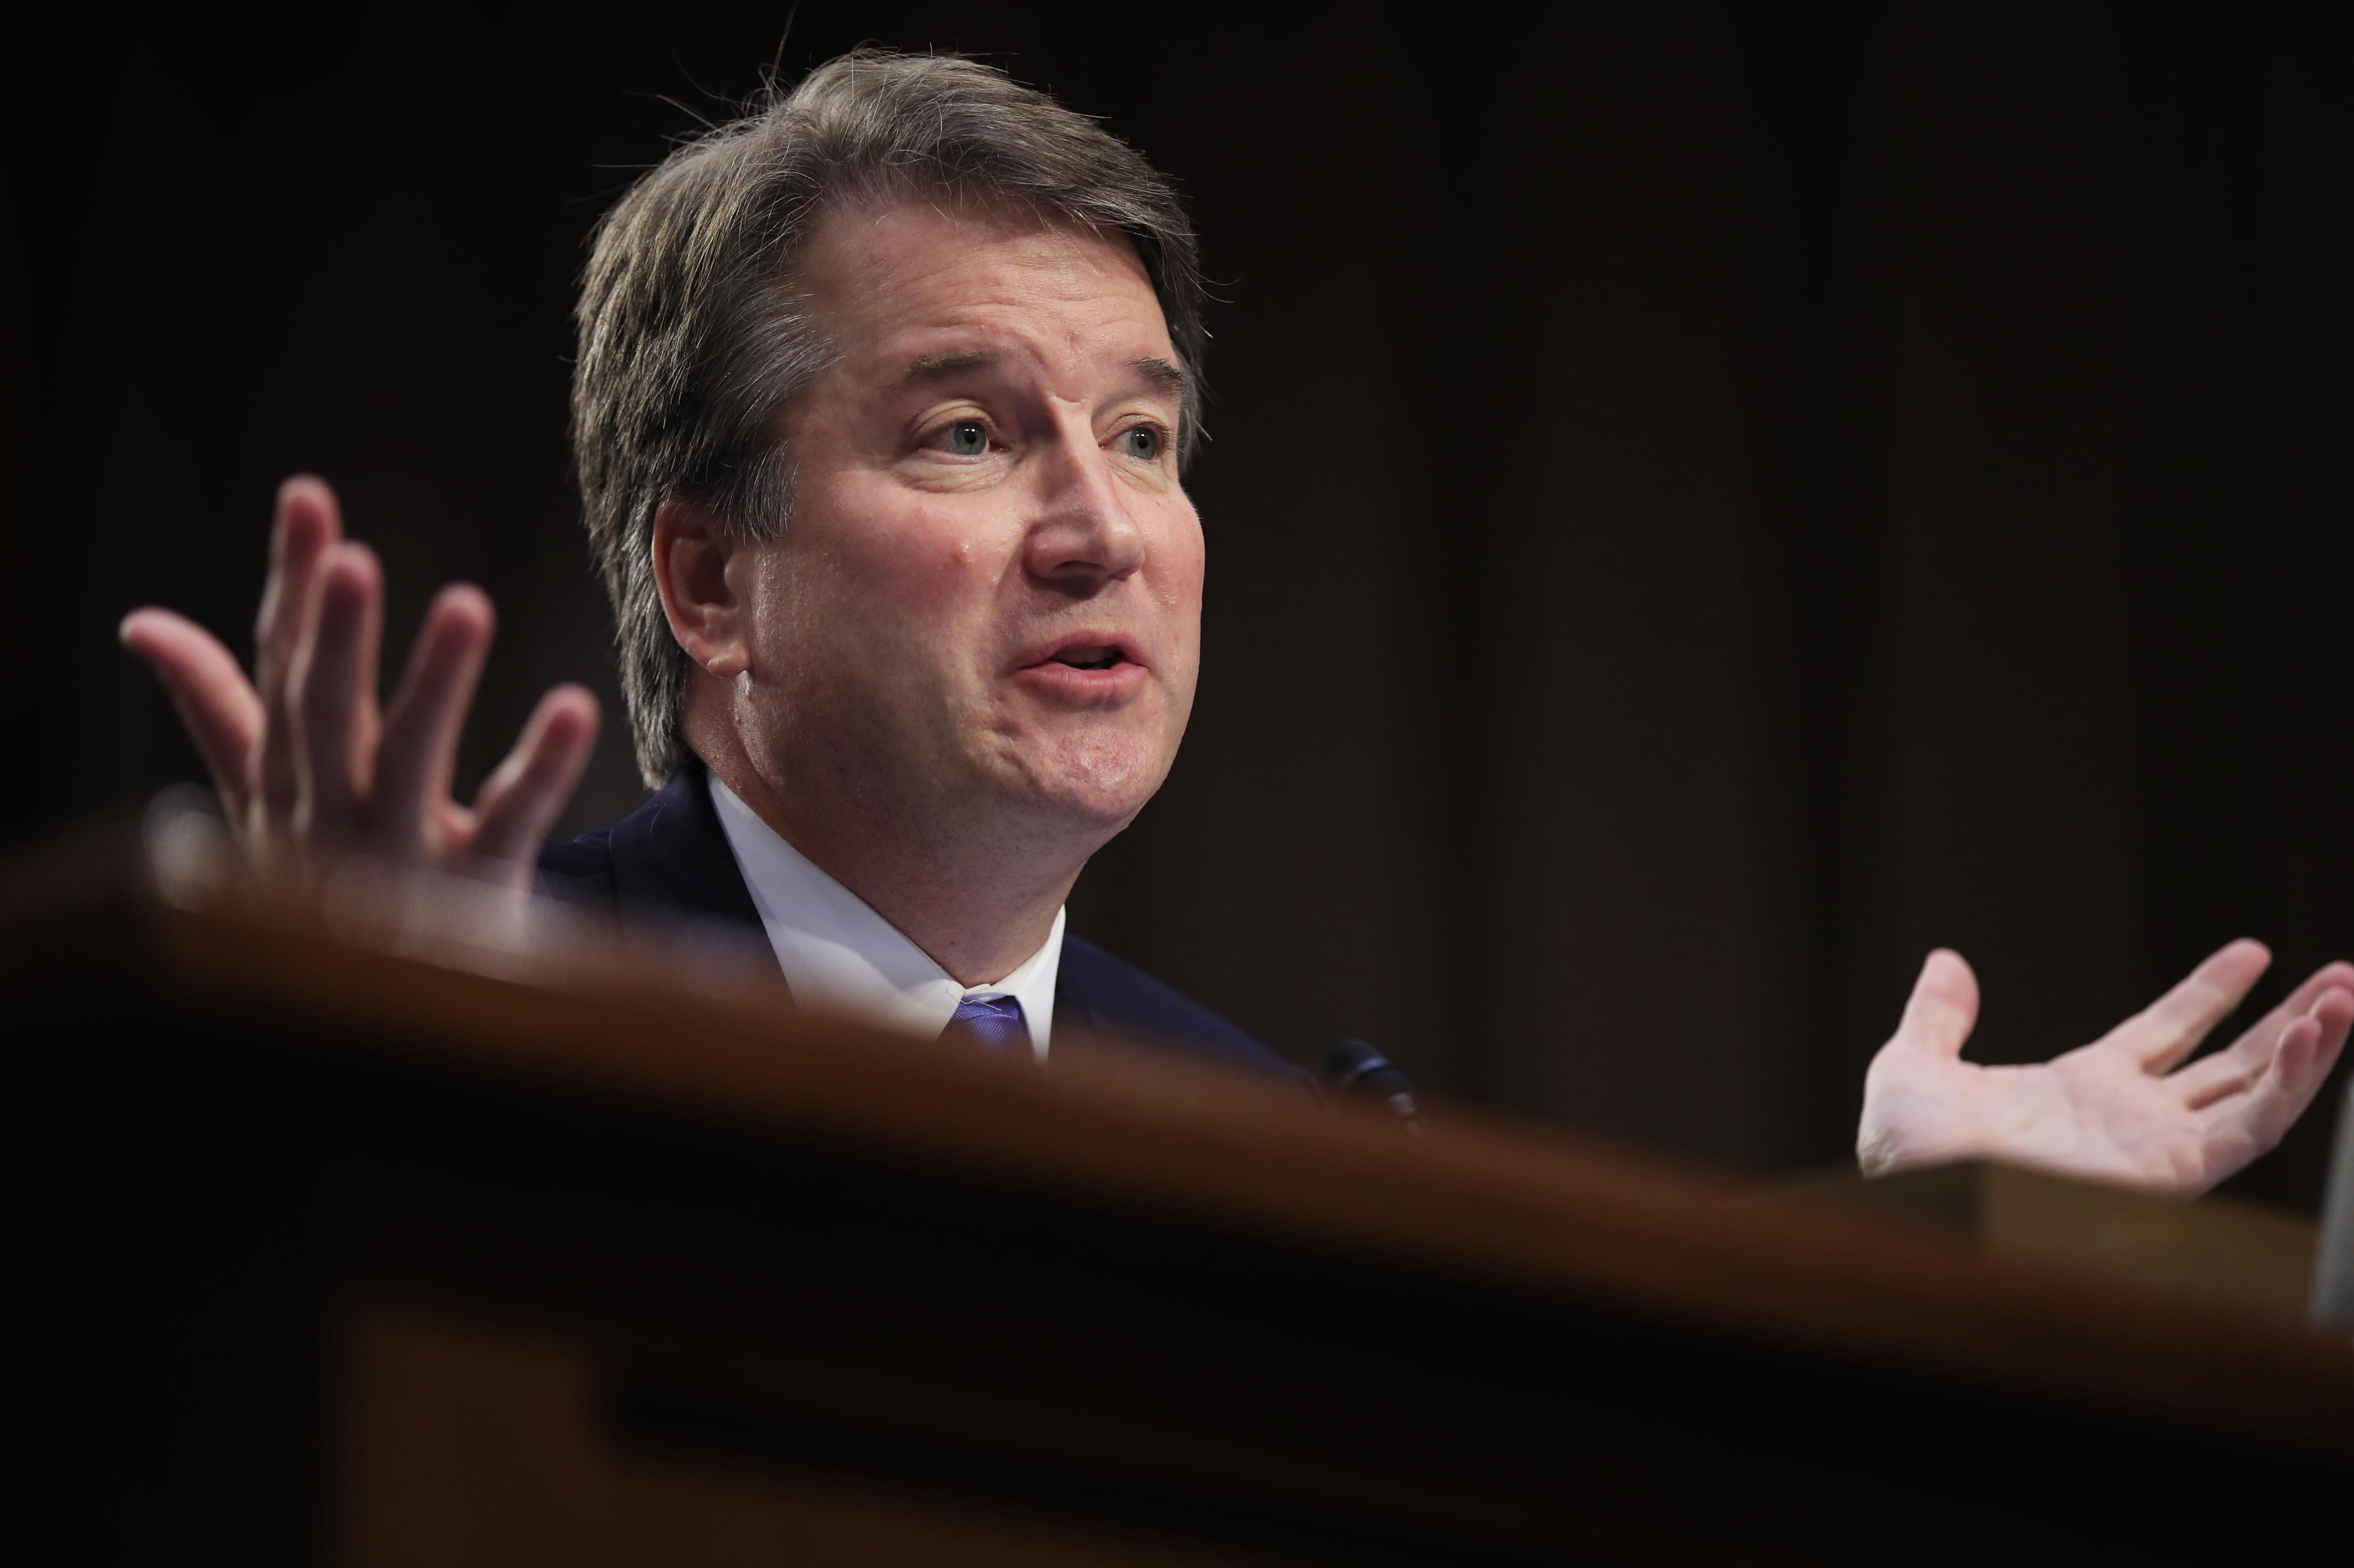 As Senate hearing set for Kavanaugh, new accuser emerges